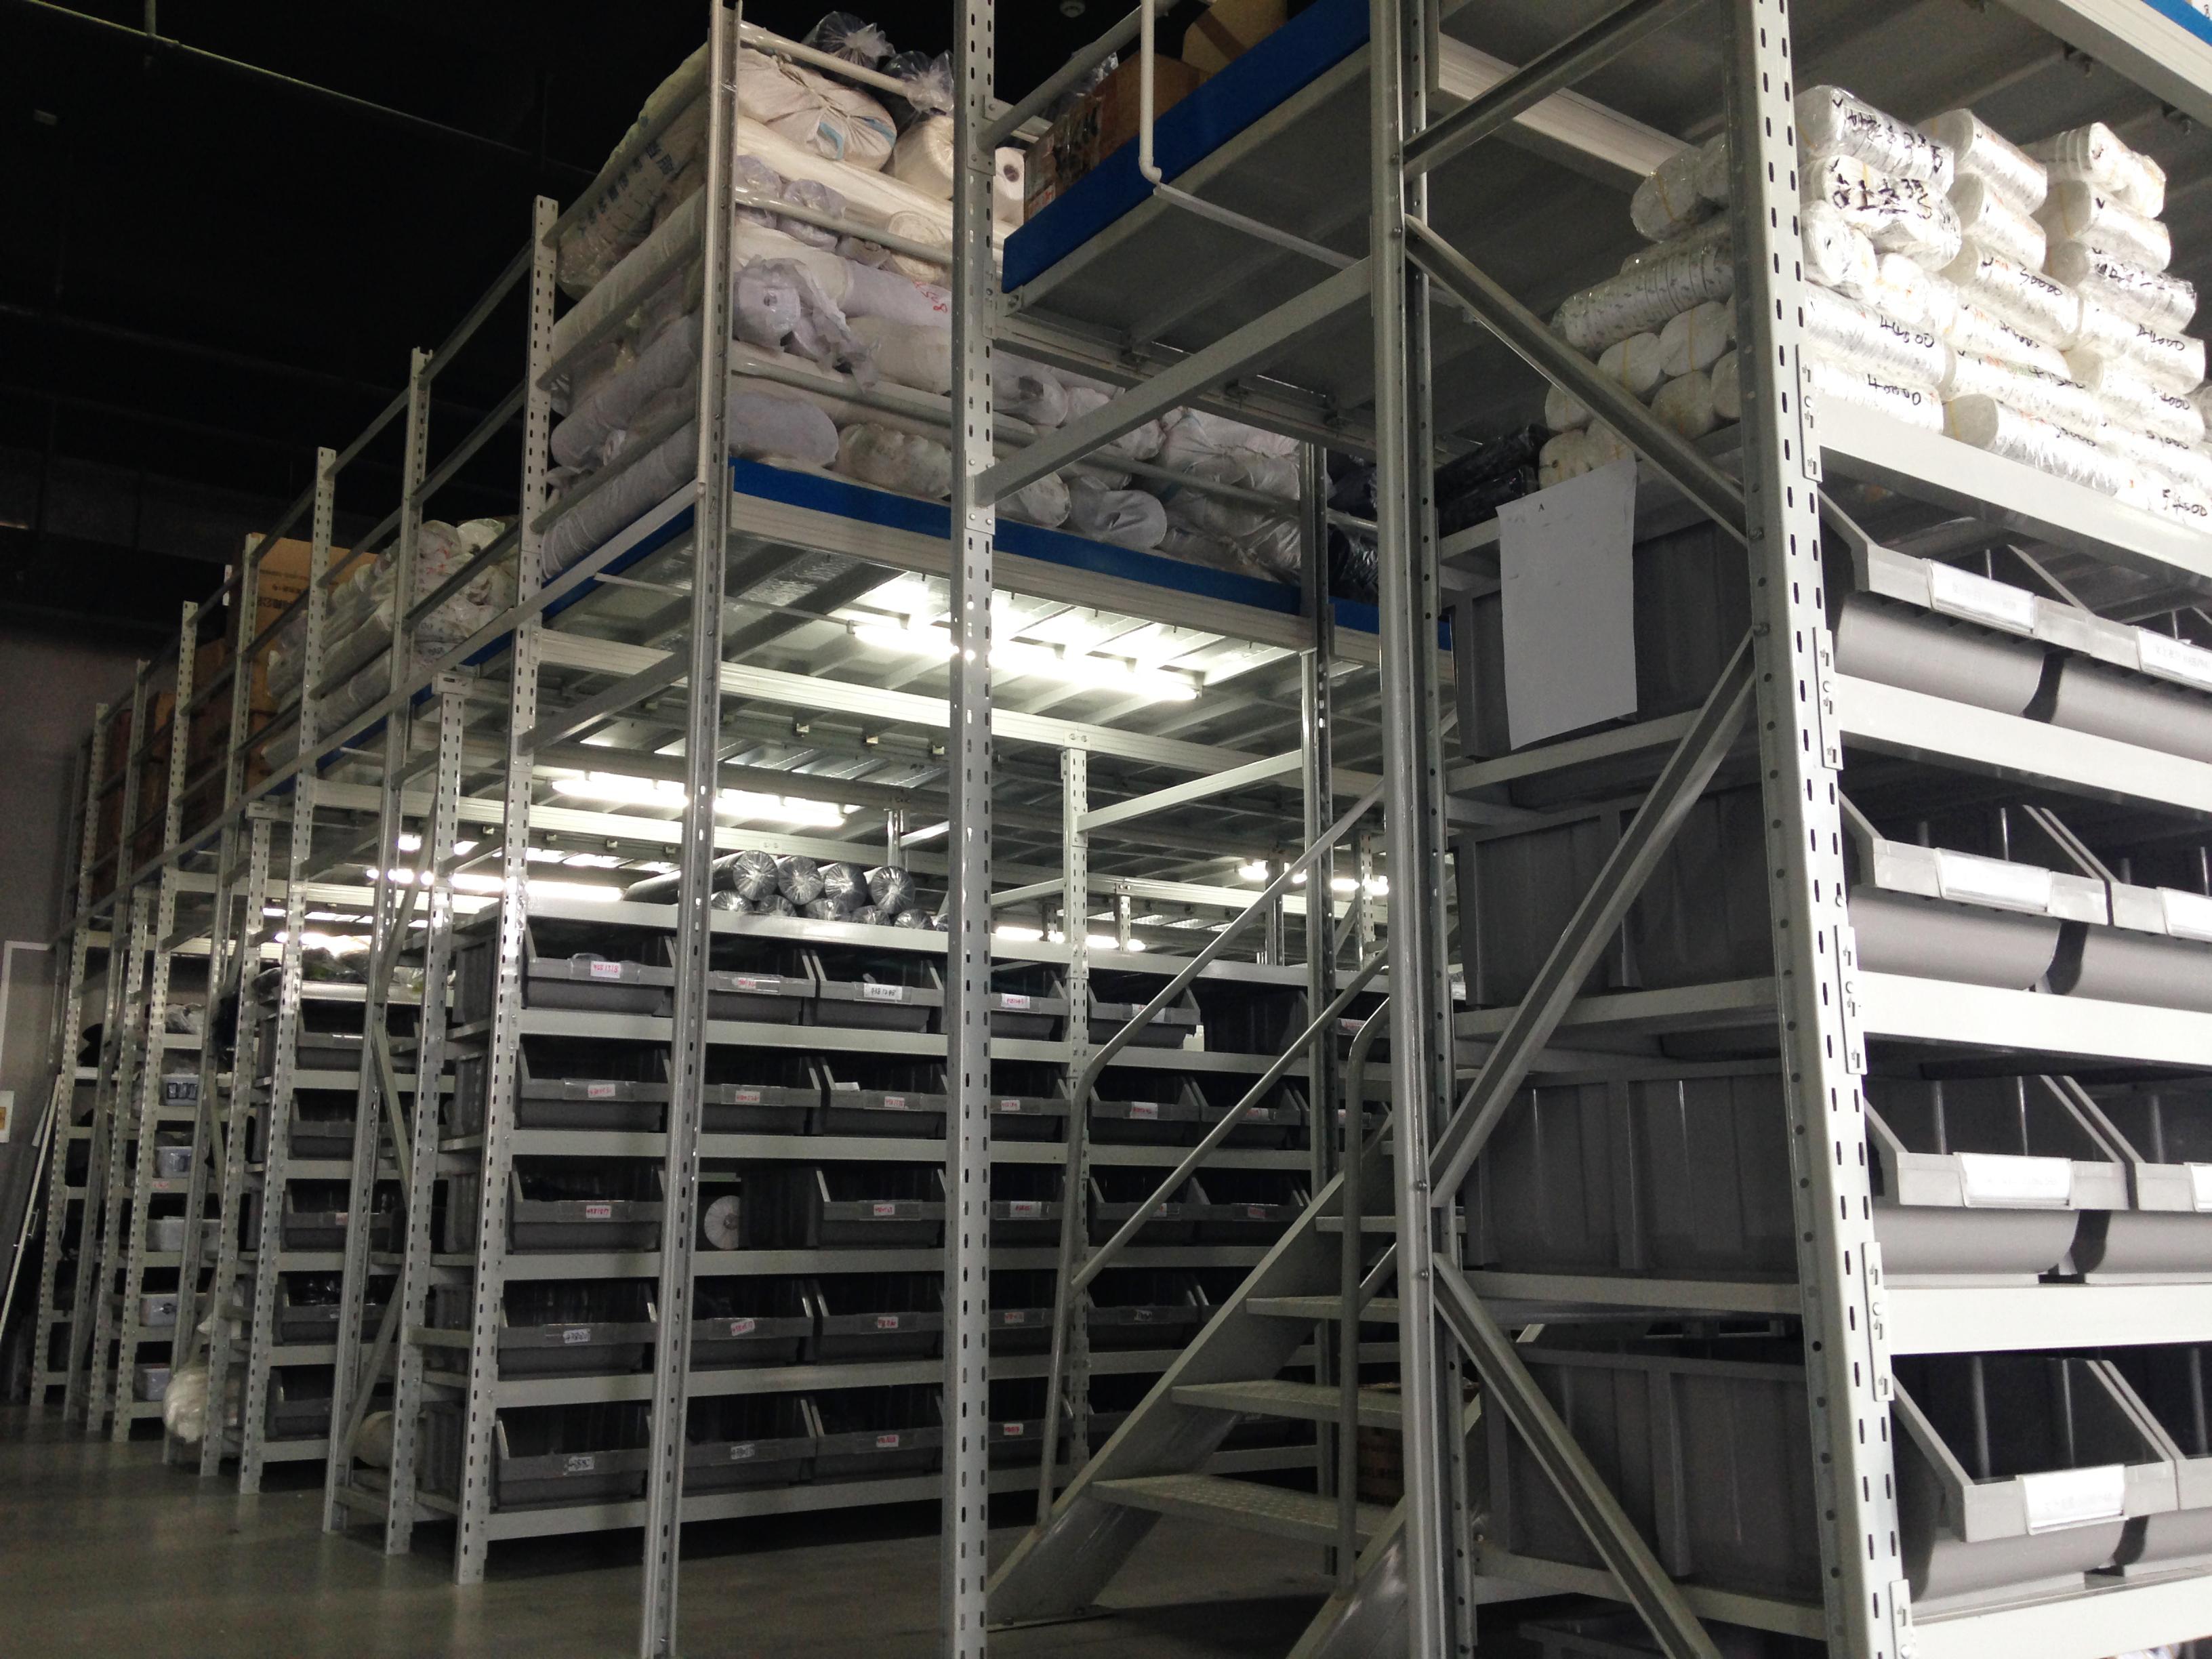 Mezzanine Platform Racking System With Pallet Racking Pallet Rack Racking System Mezzanine